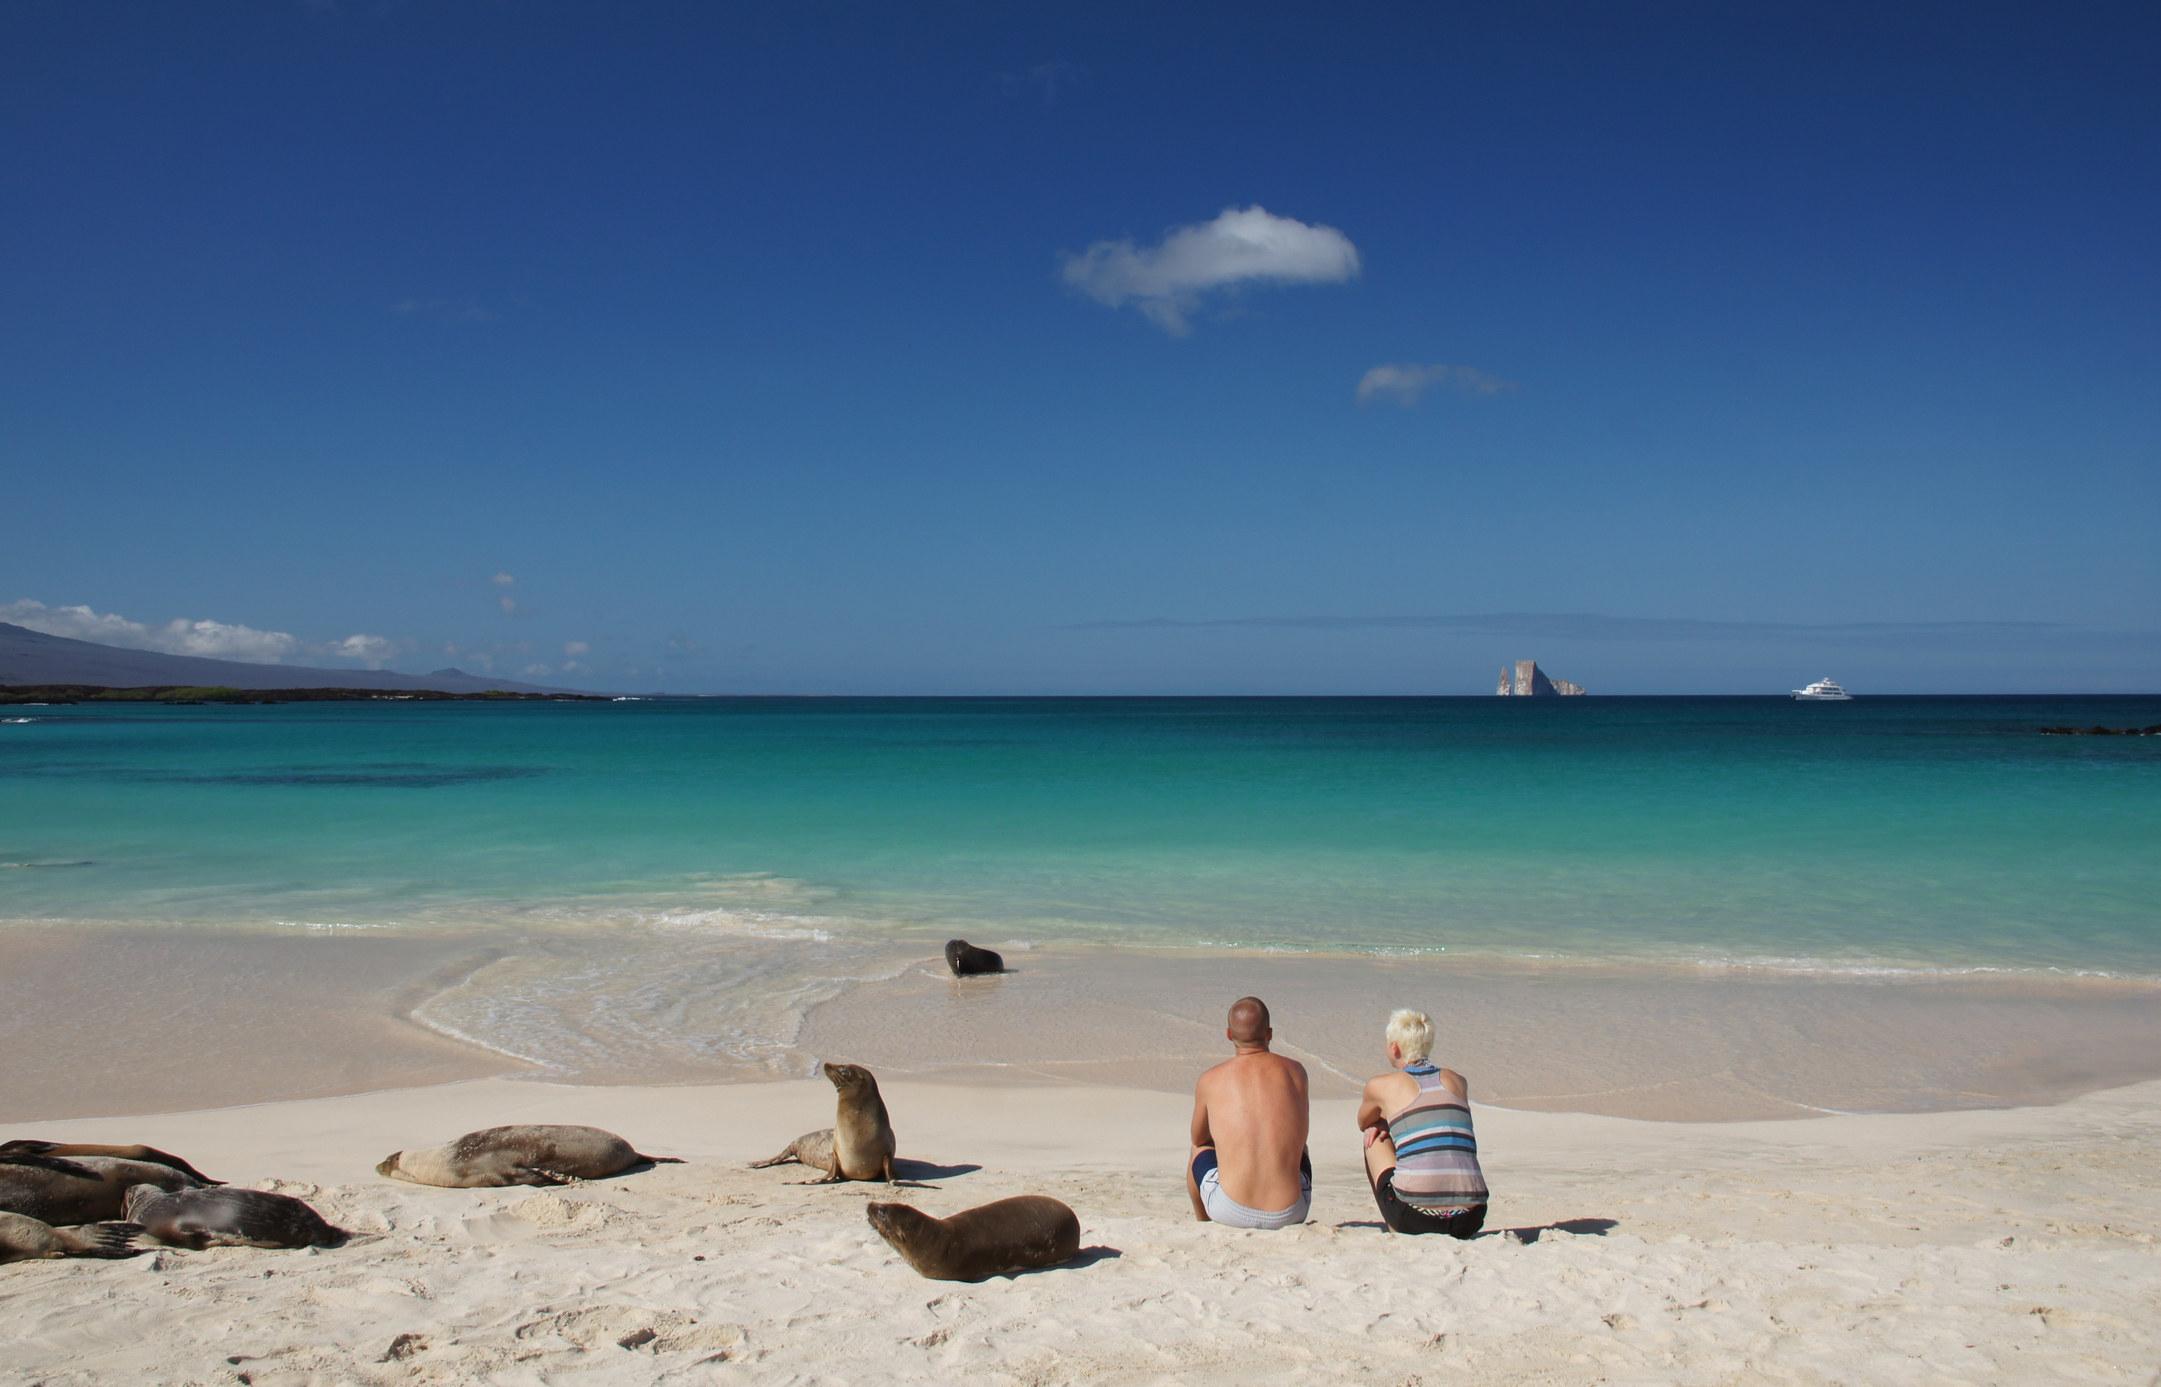 A couple sitting on a white sand beach next to wild sea lions